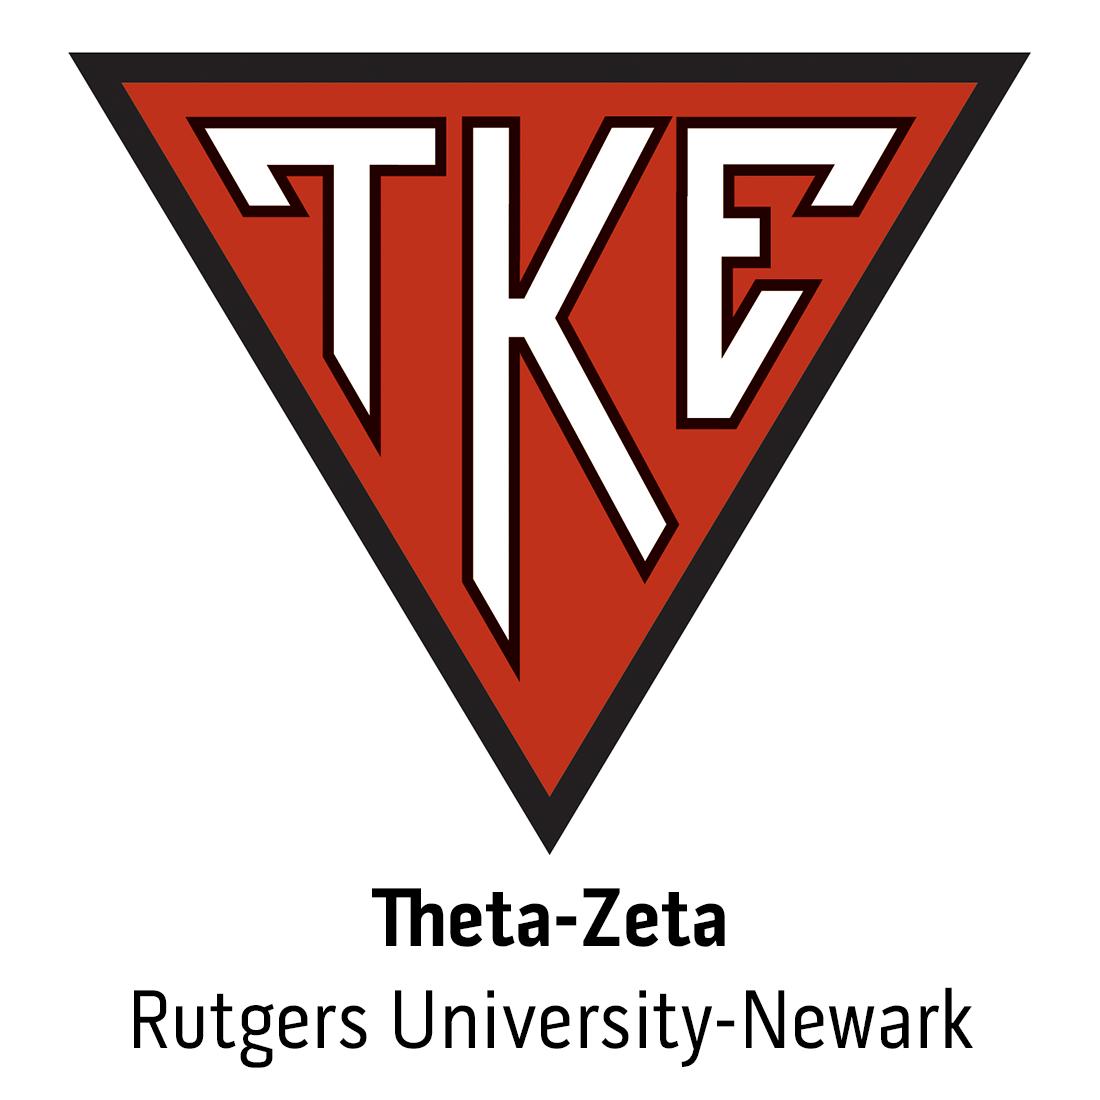 Theta-Zeta Chapter at Rutgers University, Newark